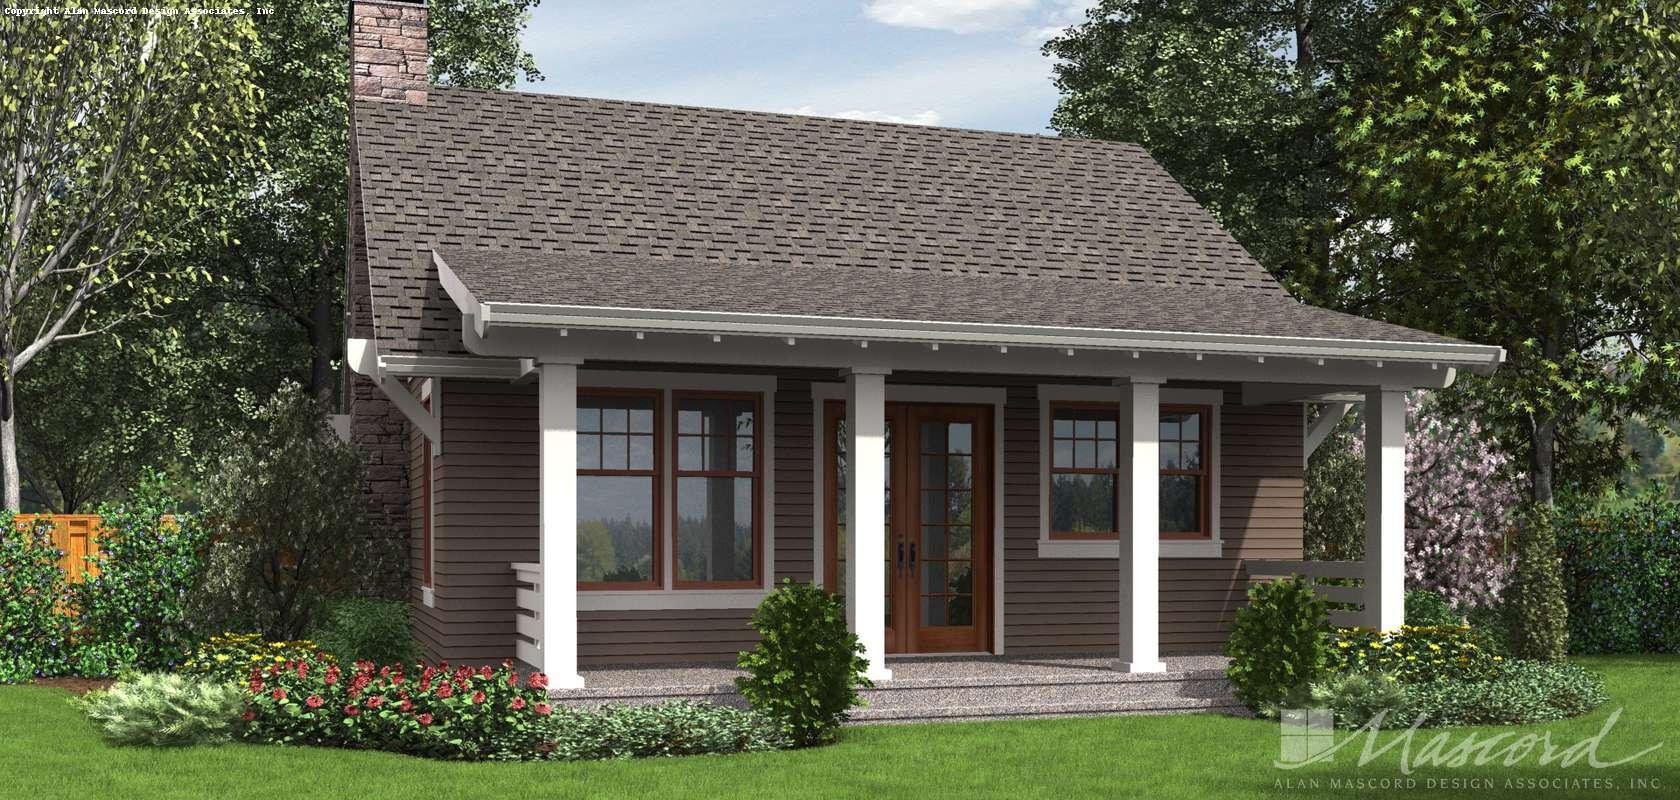 Mascord House Plan 1176: The Aumsville